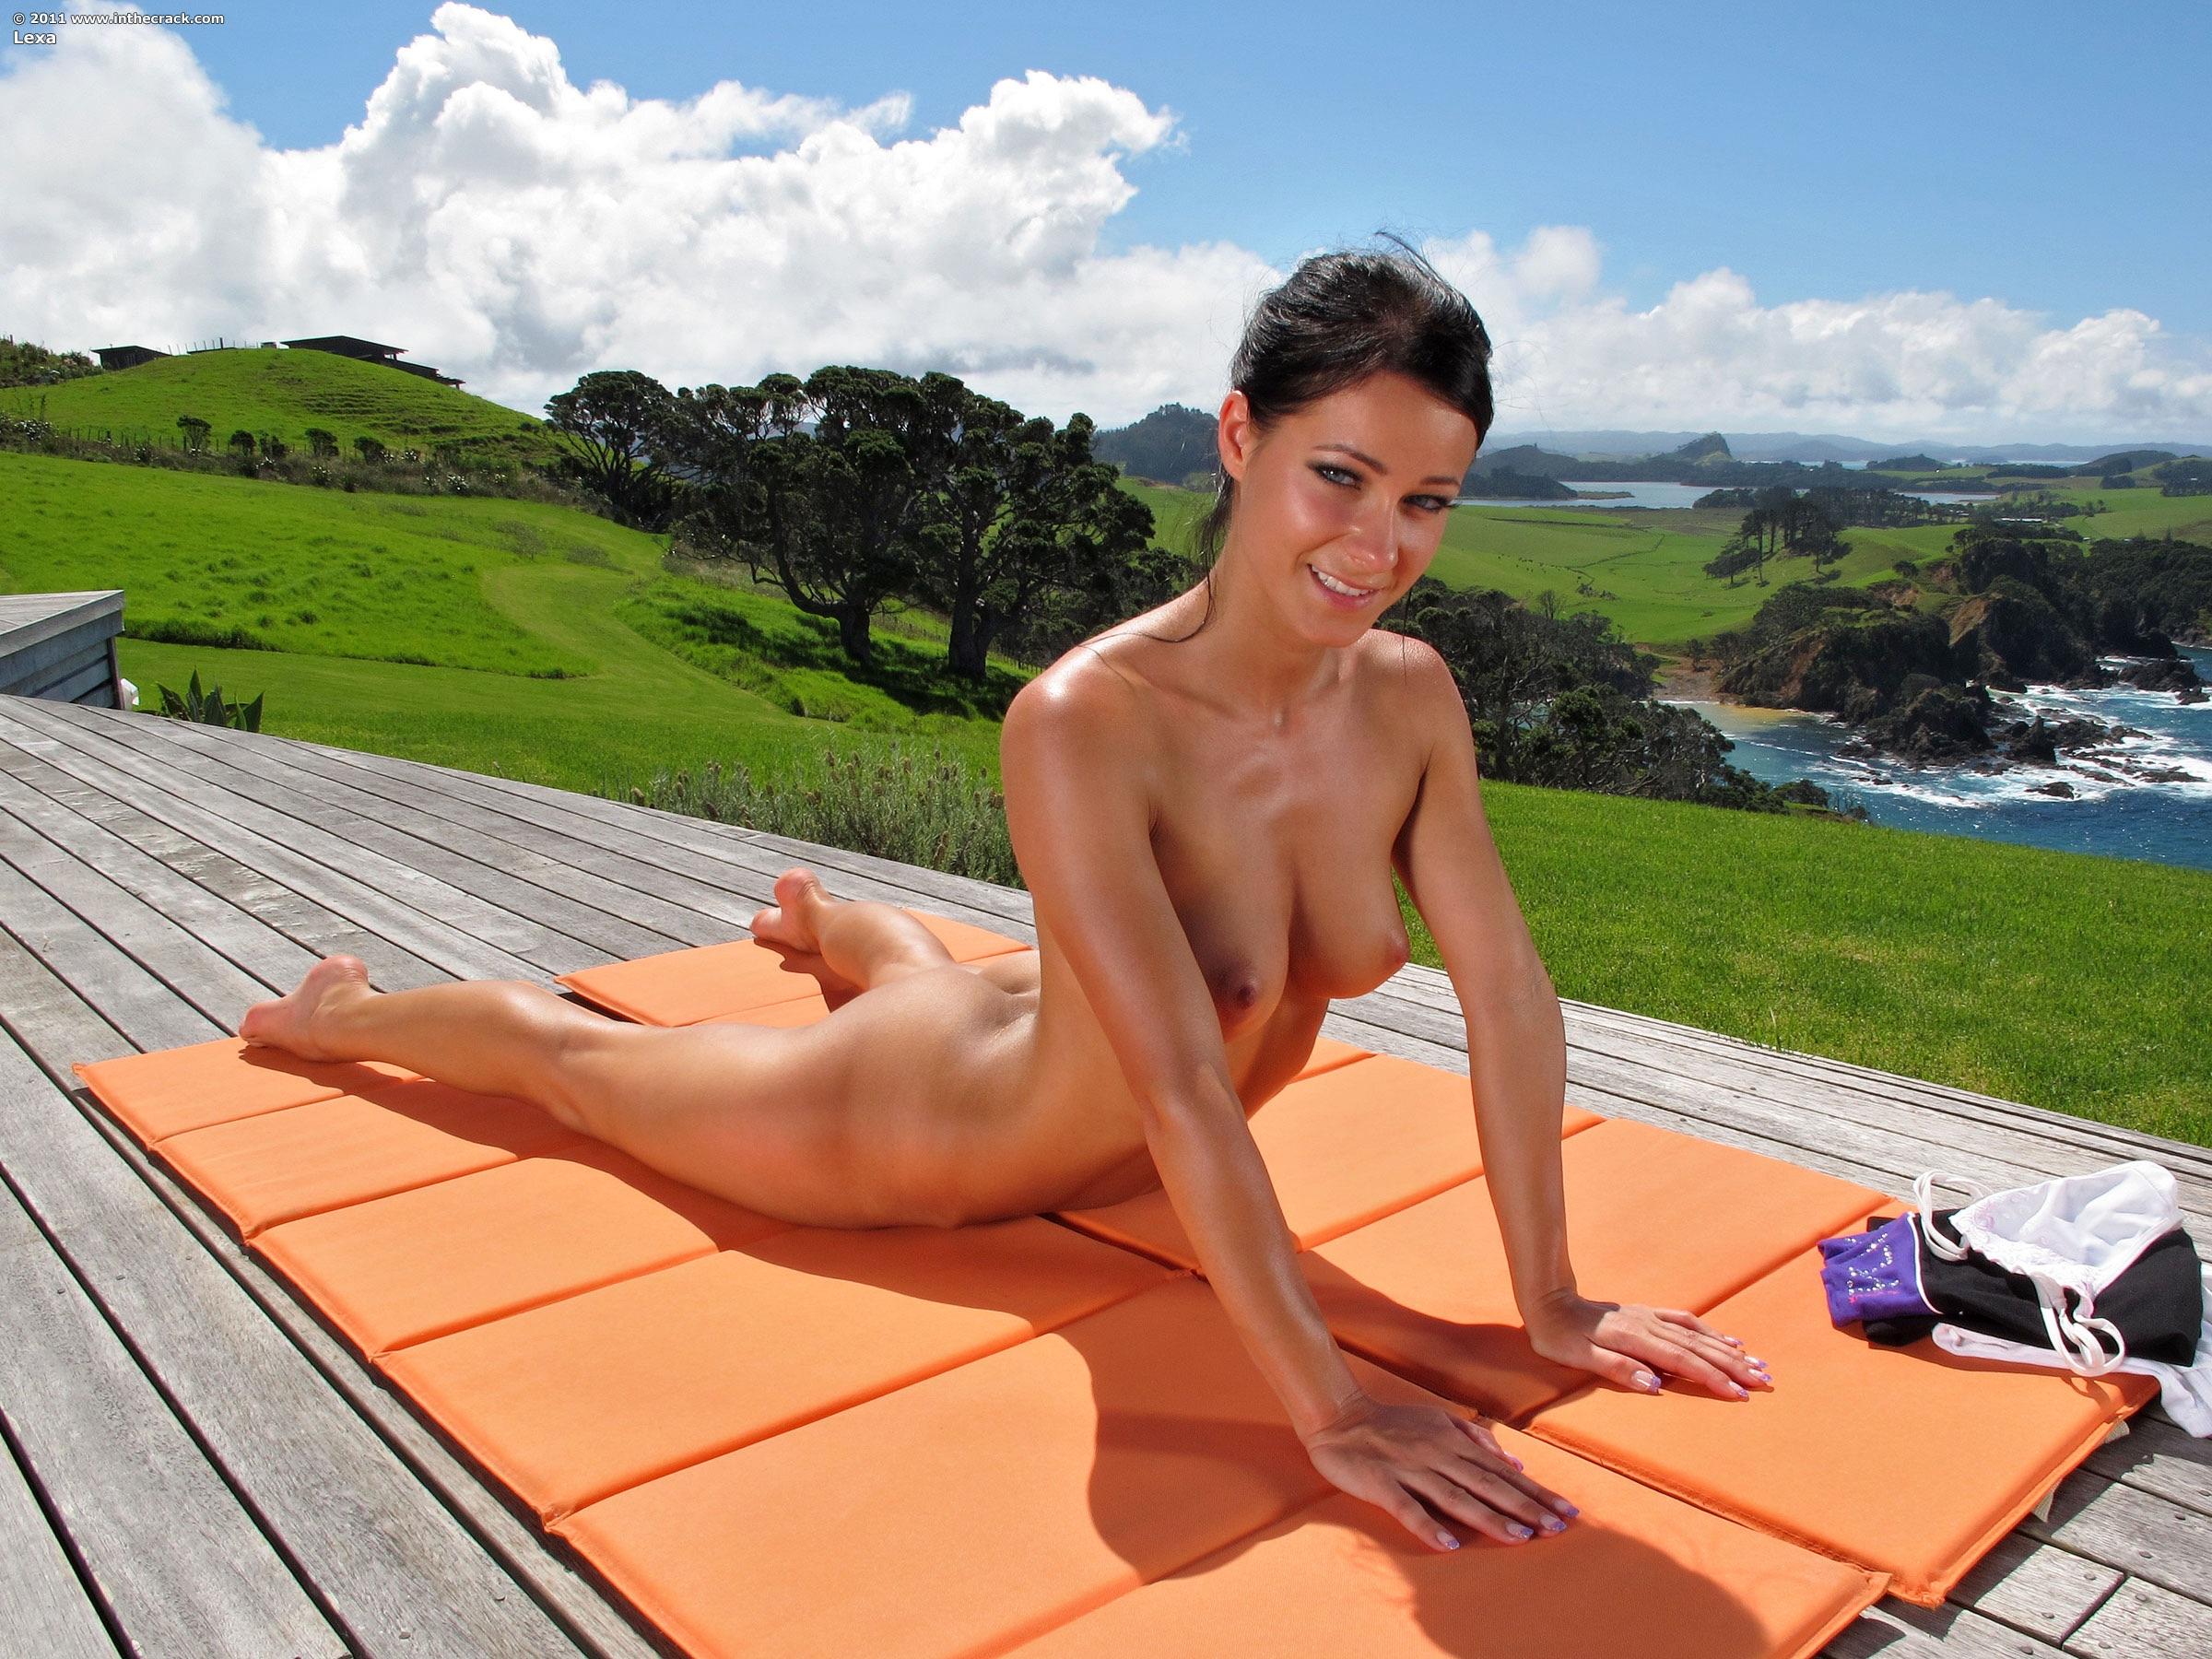 Nudes yoga Naked yoga: